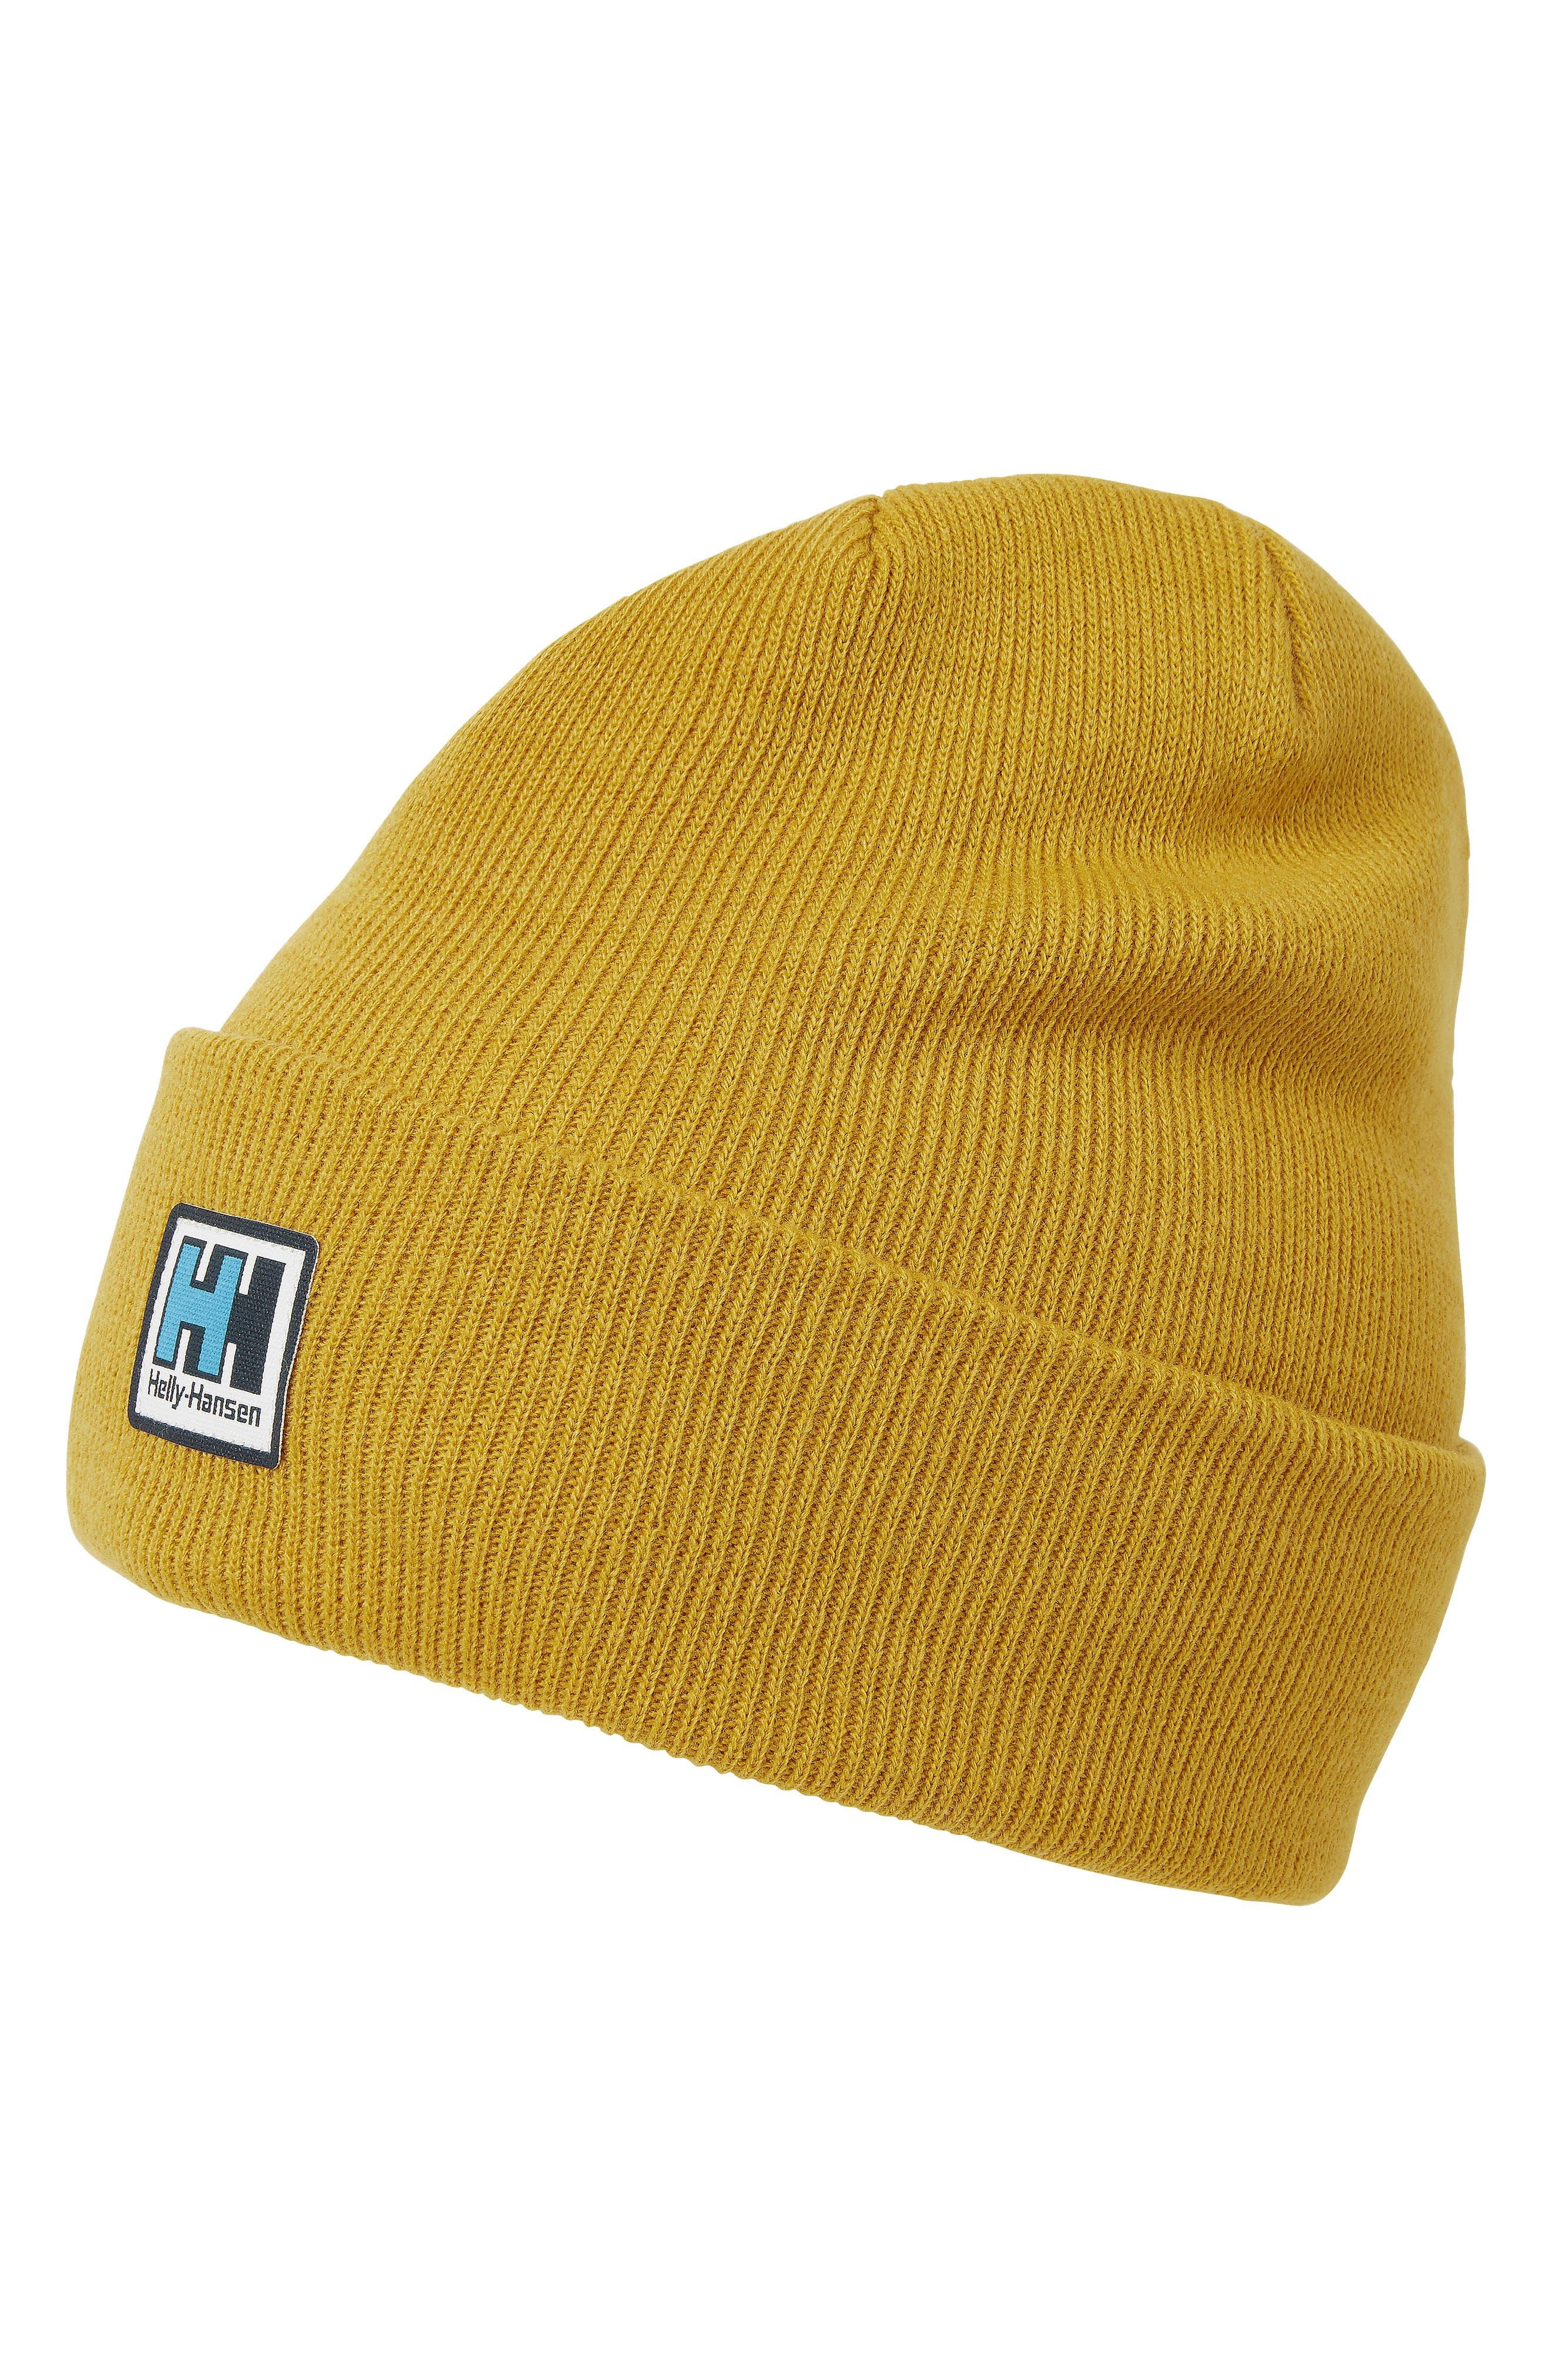 HELLY HANSEN Urban Beanie - Yellow in Arrowood